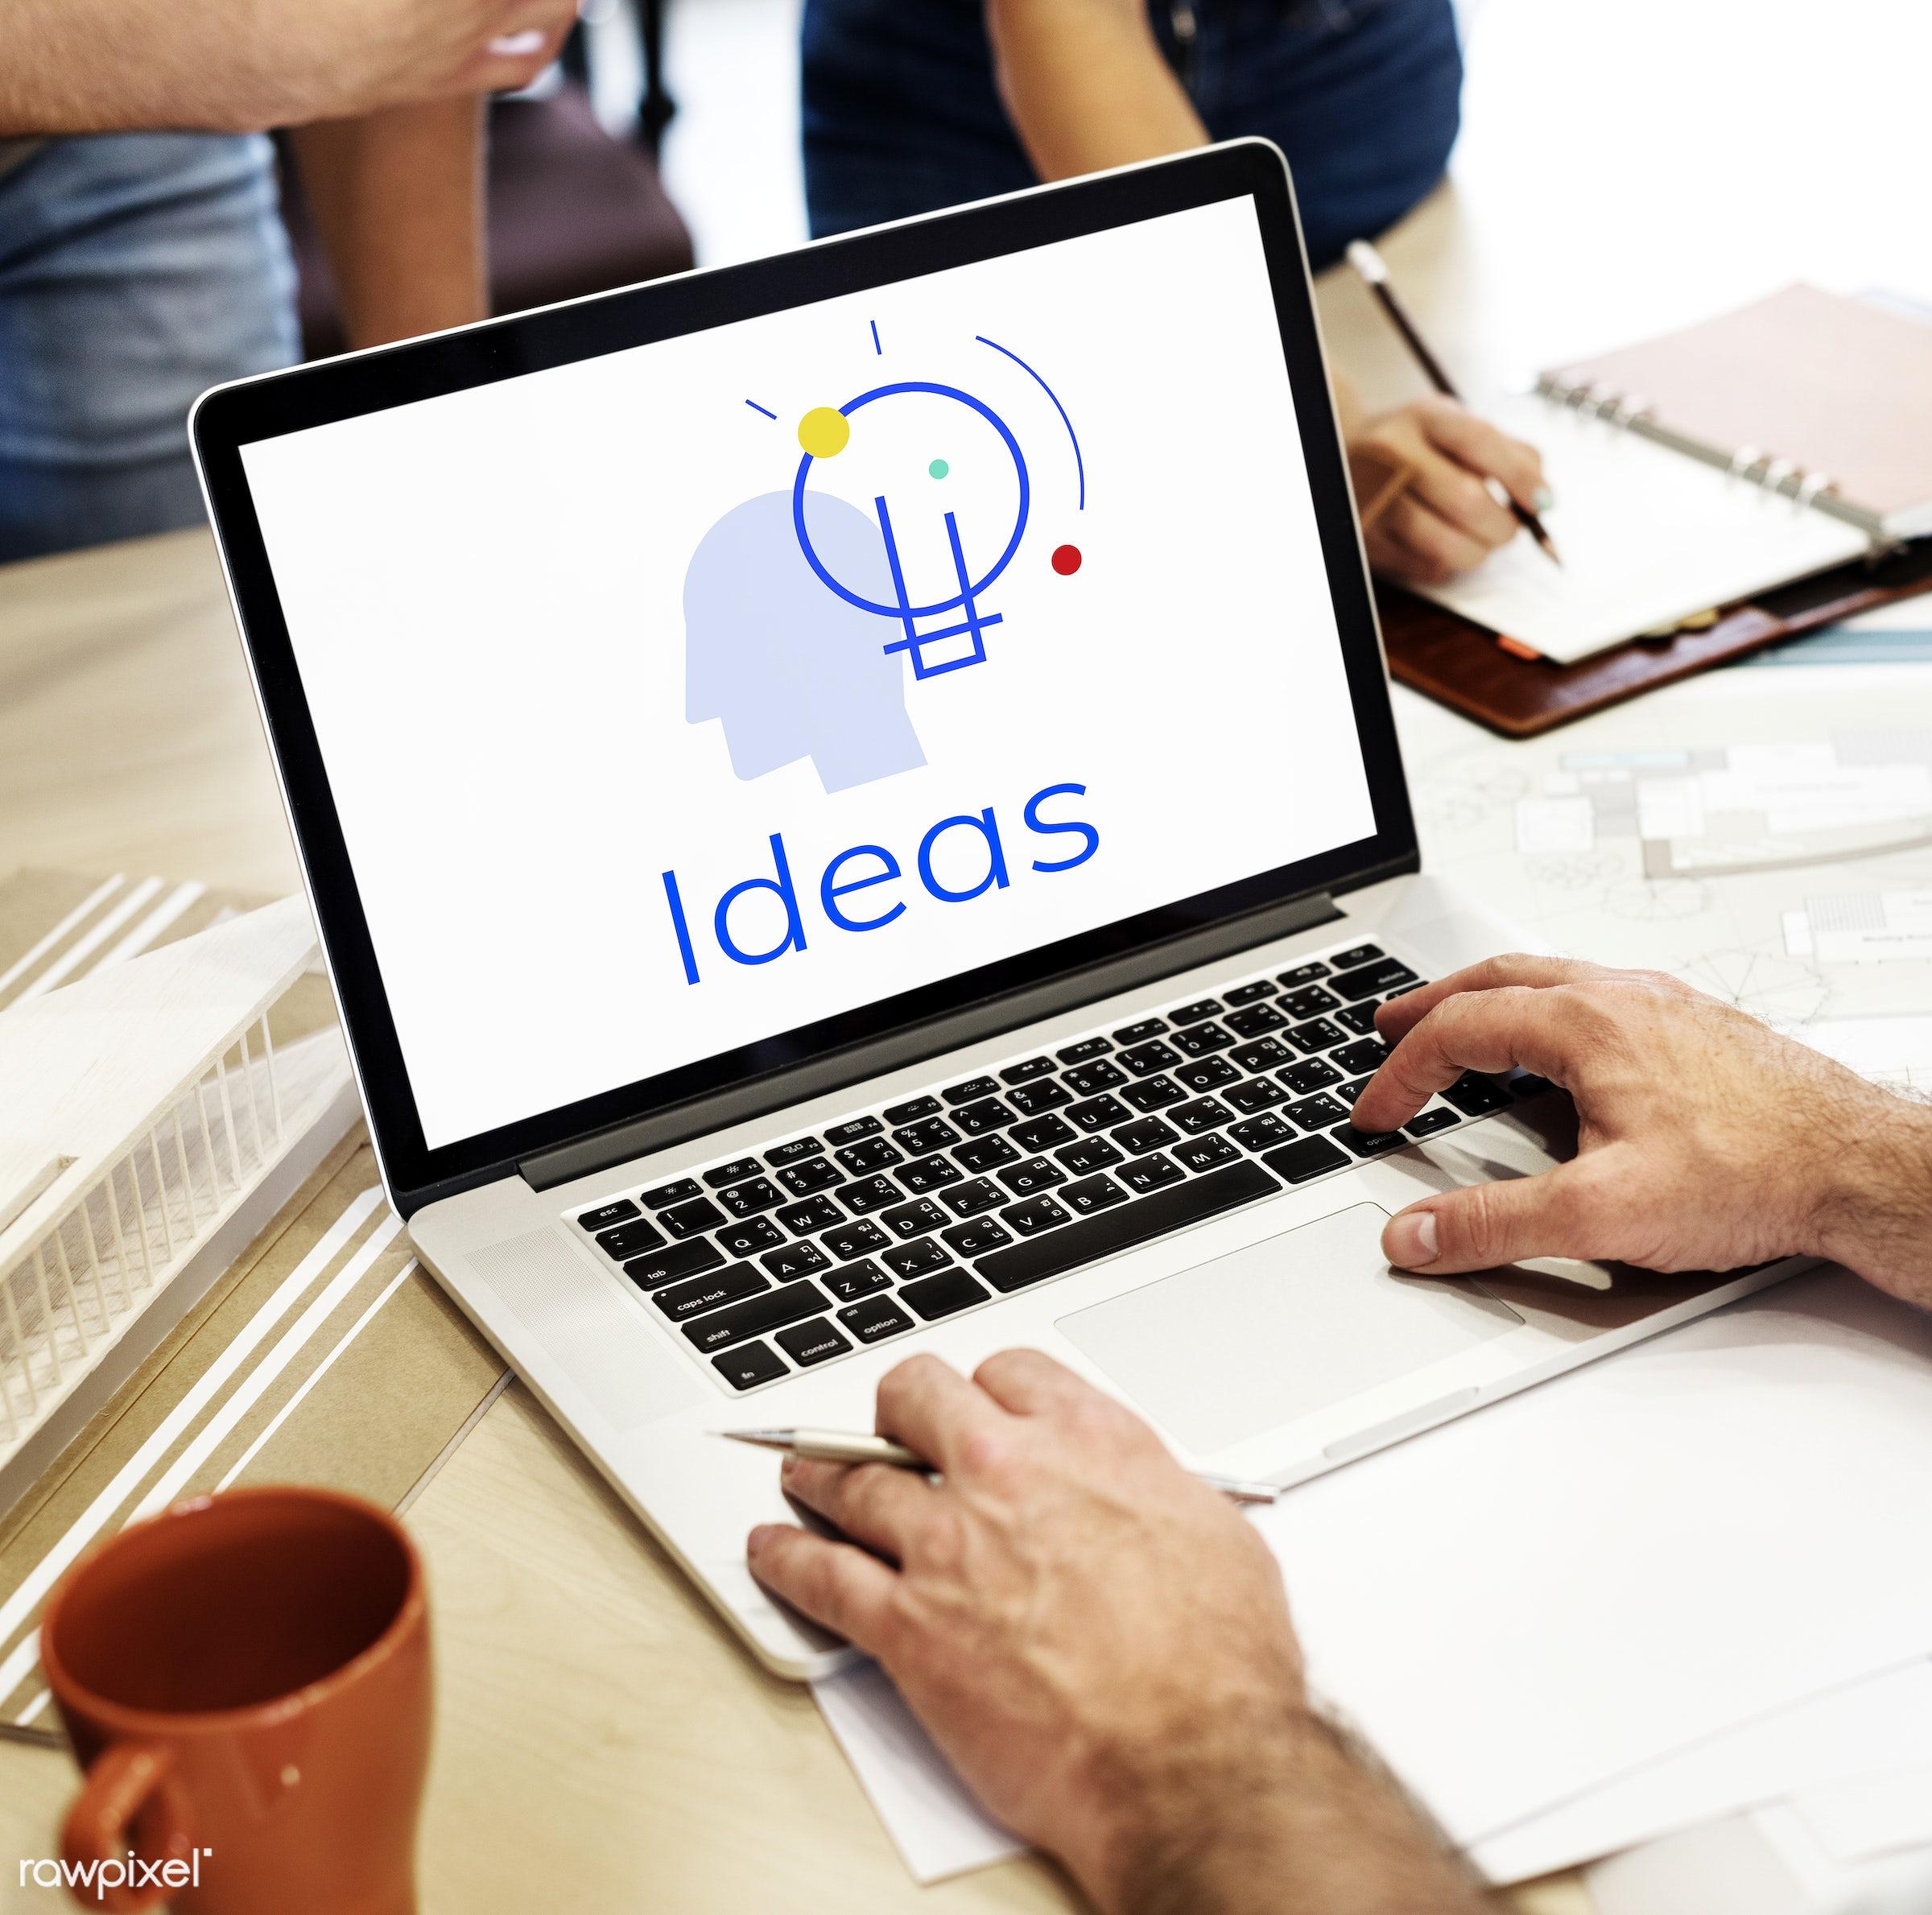 architect, architecture, art, attitude, blueprint, brainstorm, coffee, coffee cup, create, creative, creativity, cup, design...